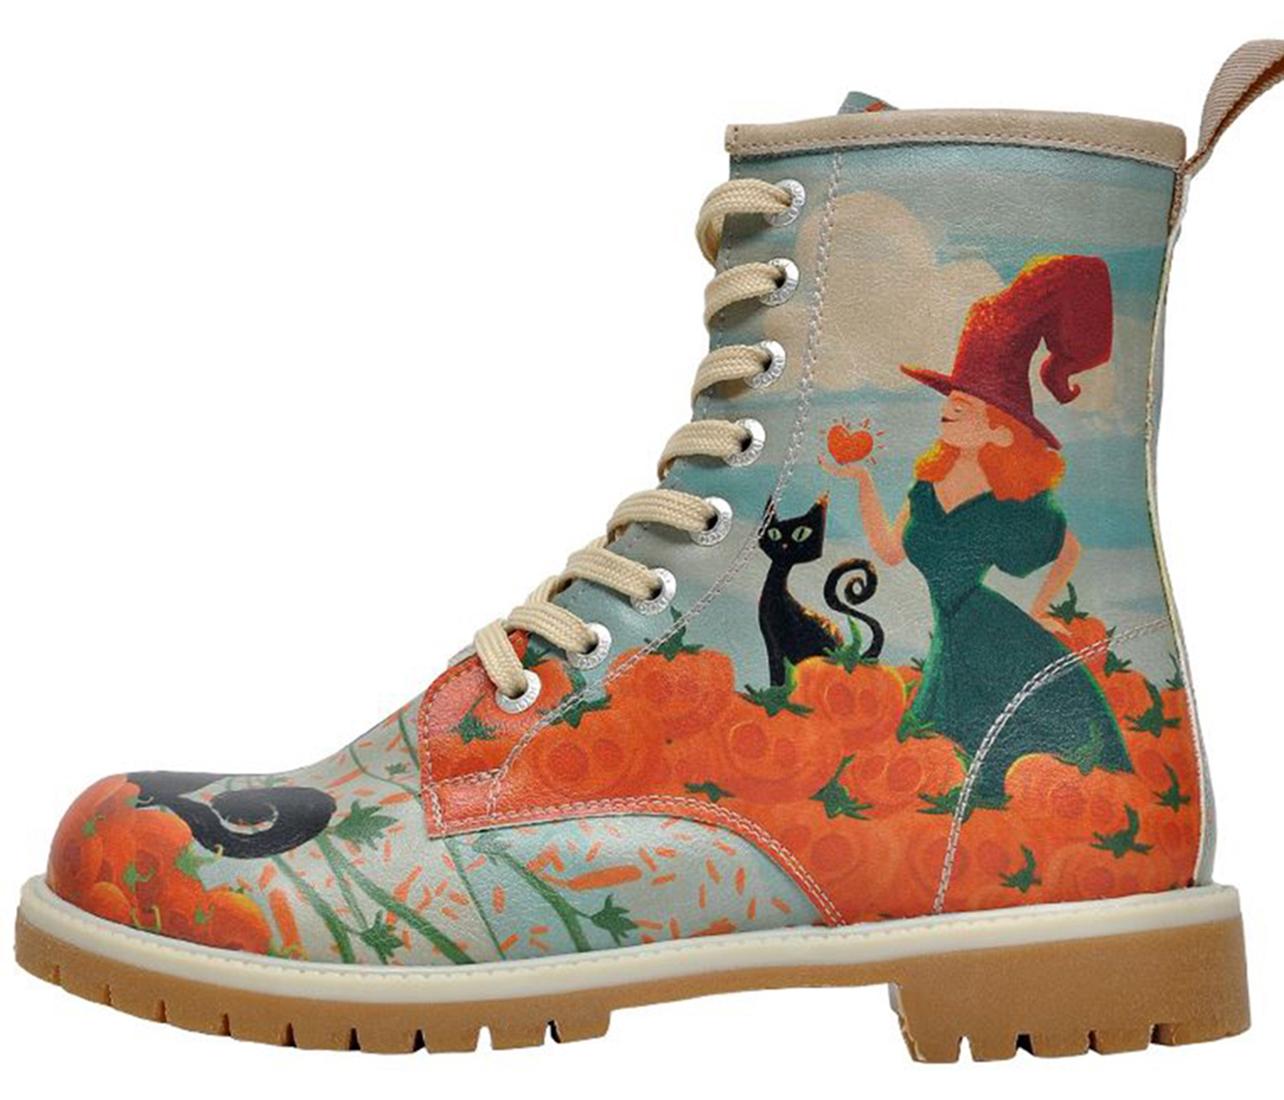 dgs018-LB080_Pumpkin Witch_05